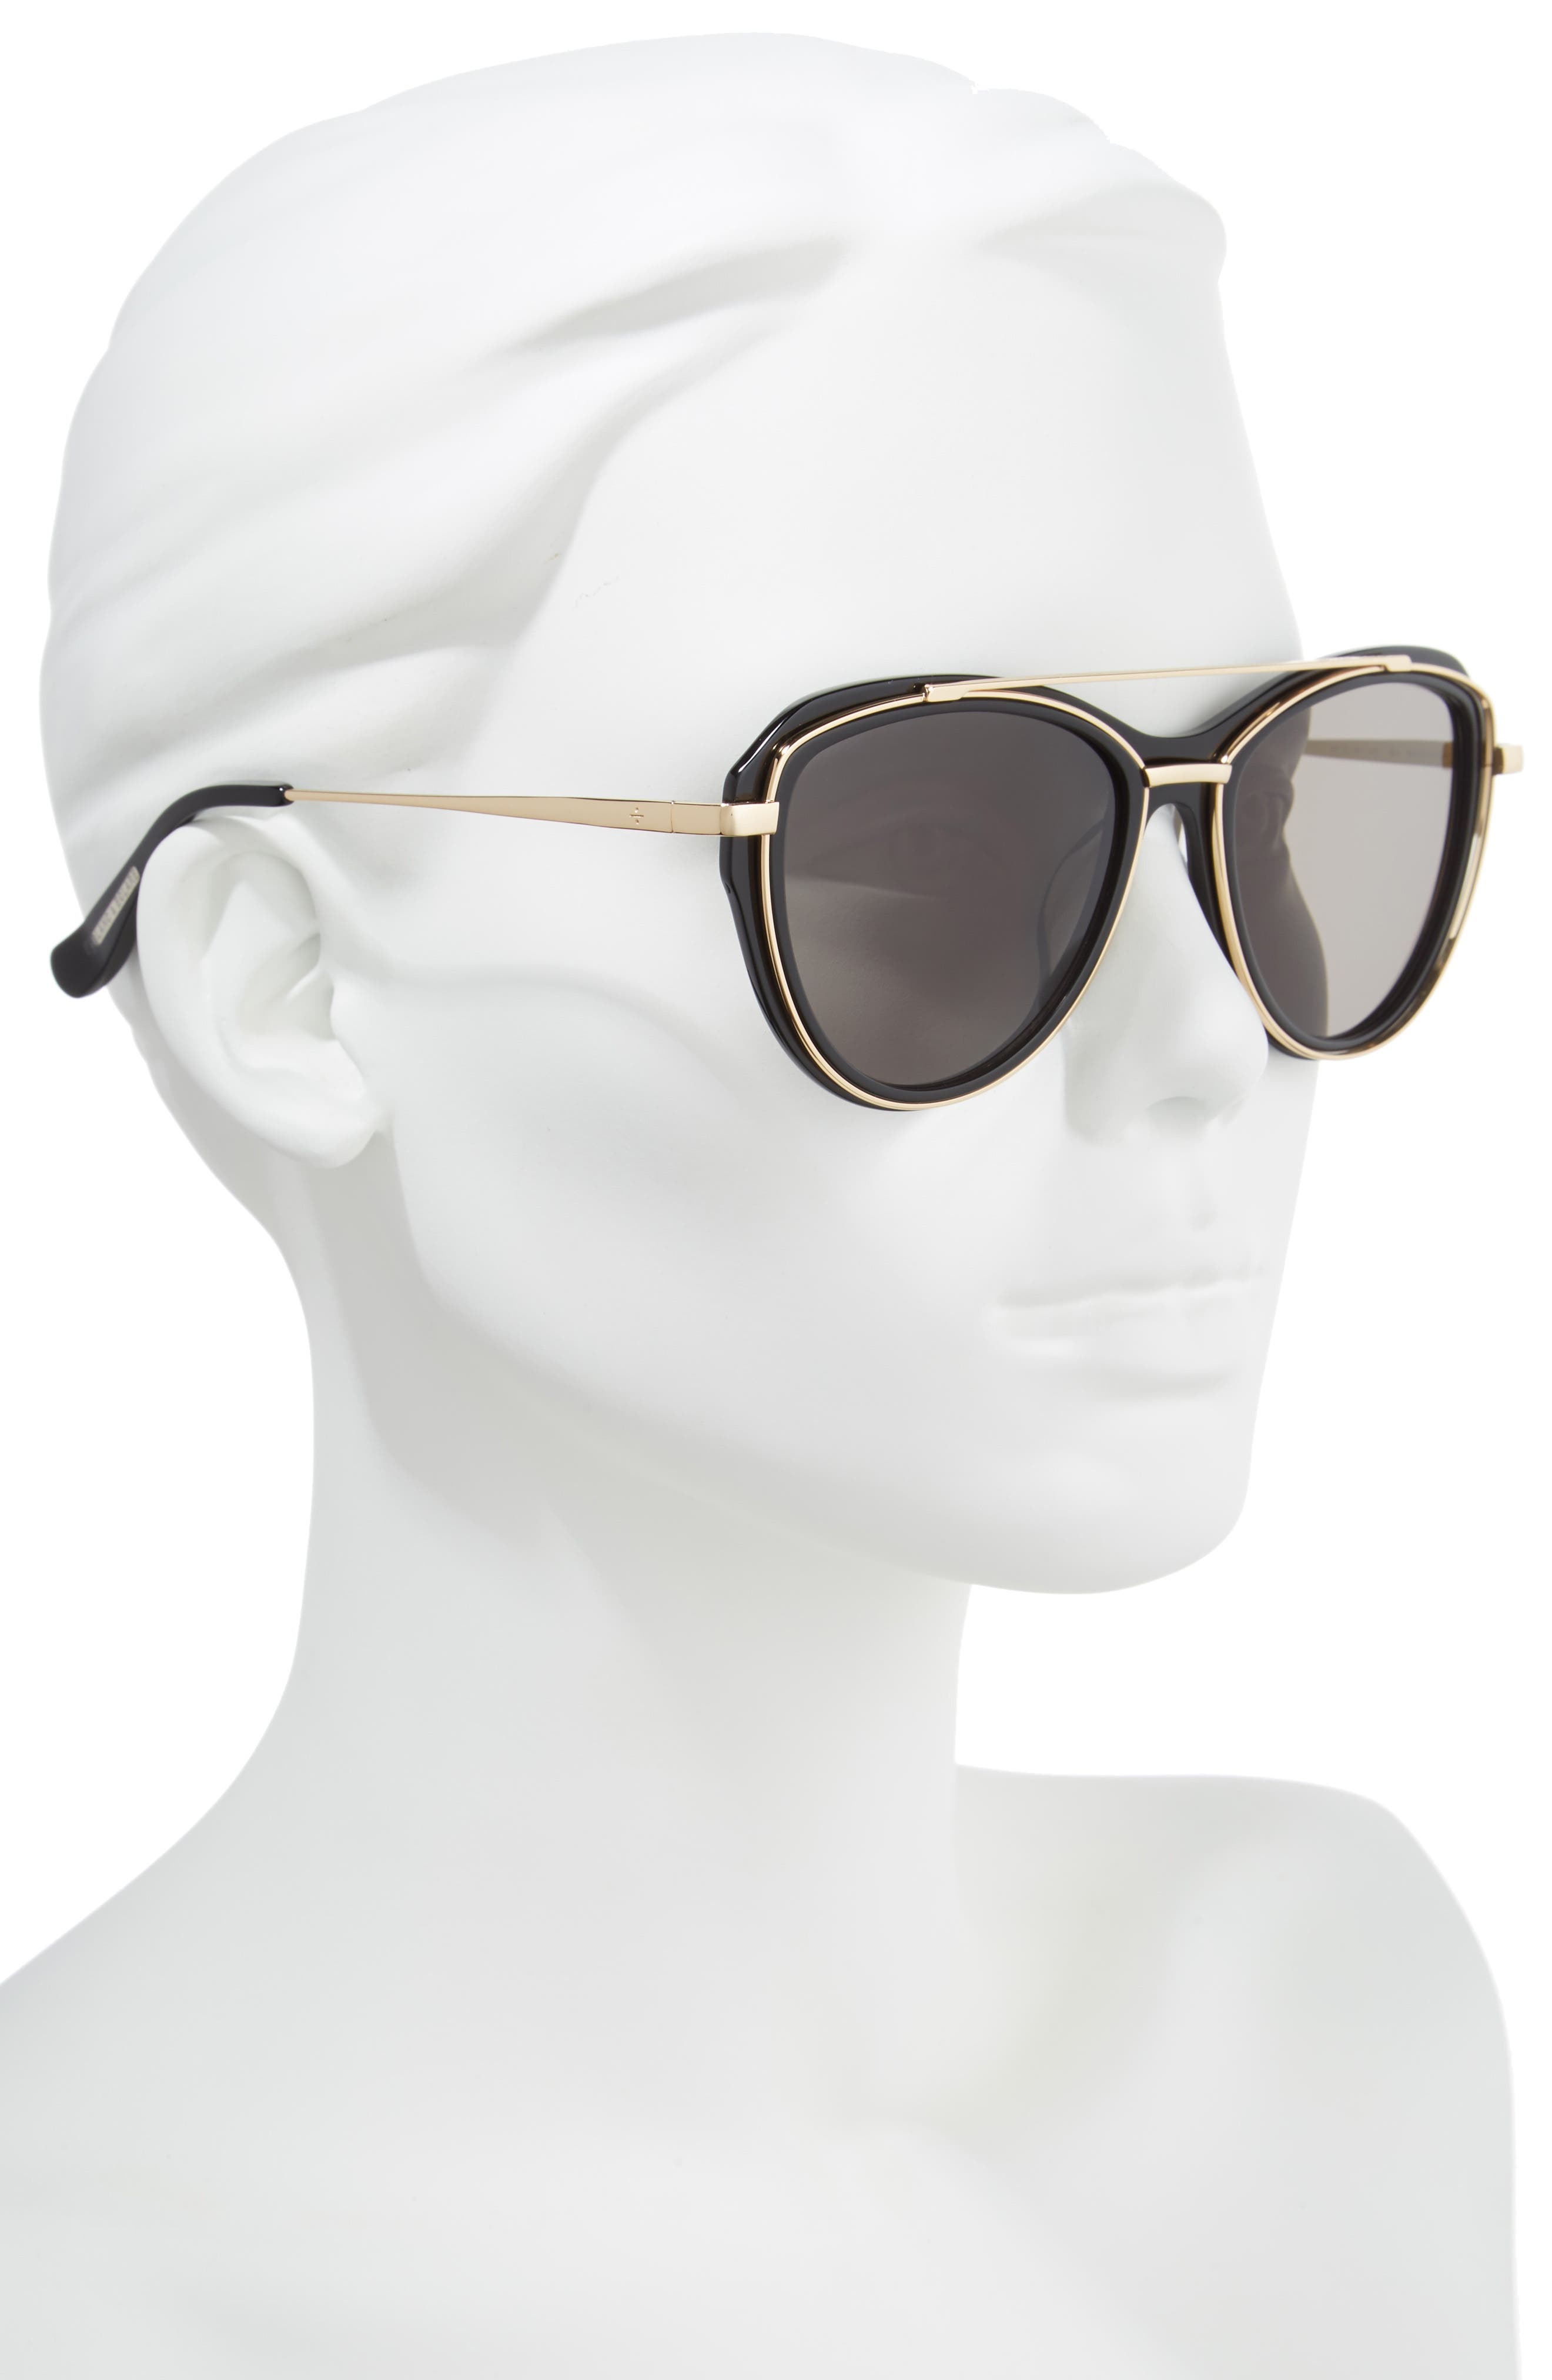 BLANC & ECLARE Marrakesh 57mm Aviator Sunglasses,                             Alternate thumbnail 2, color,                             001